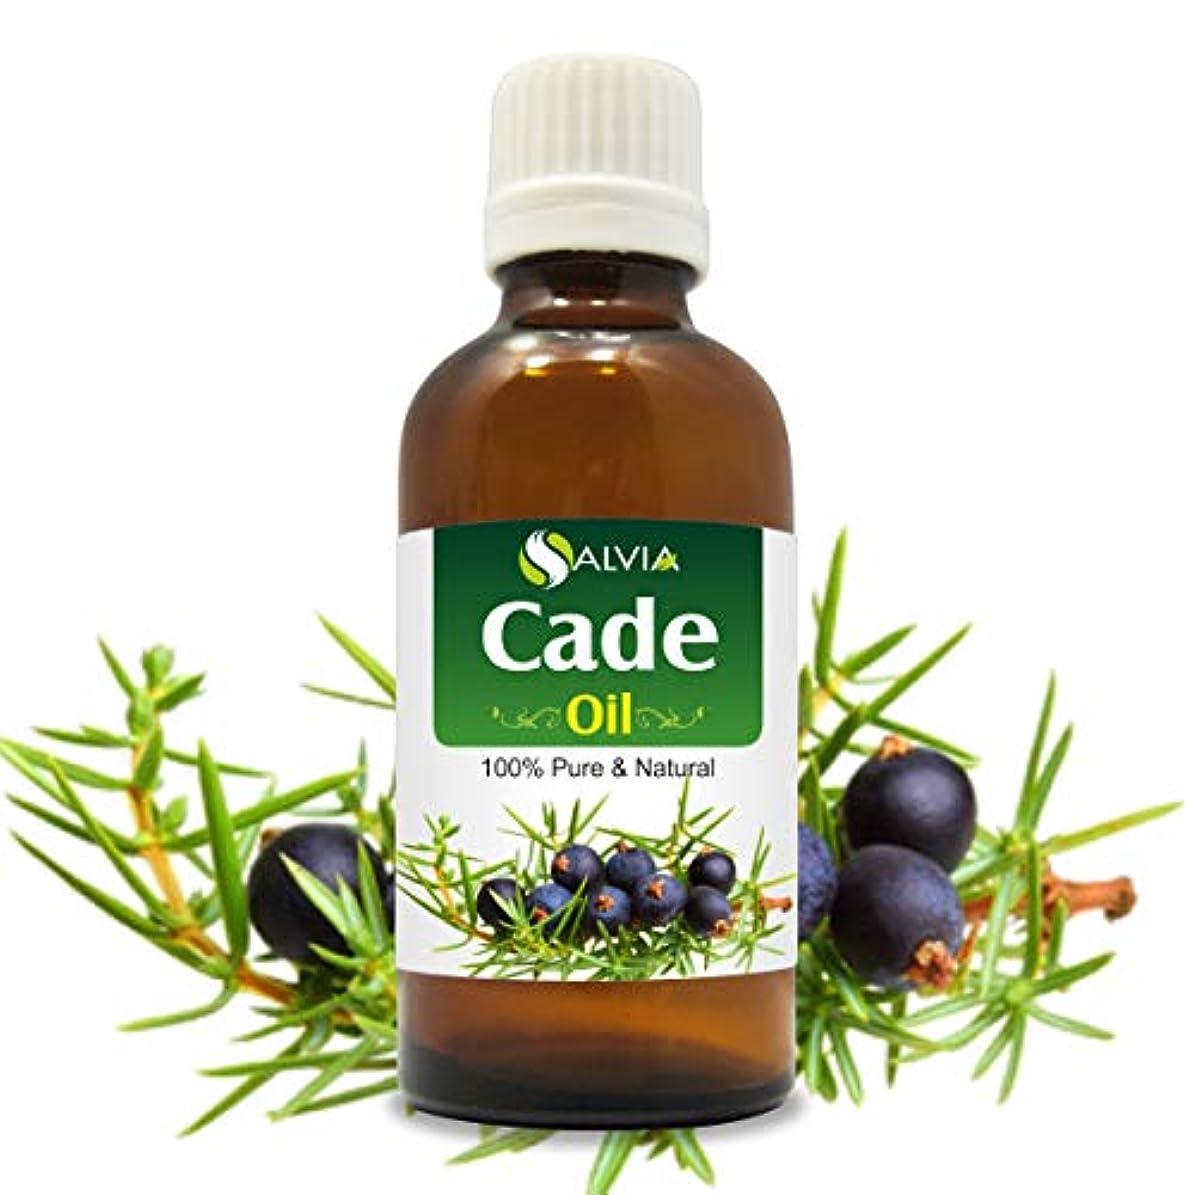 名誉電池交換可能Cade Essential Oil (Juniperus oxycedrus) Therapeutic Oil 100% Pure & Natural - Undiluted Uncut Aromatherapy Oil...